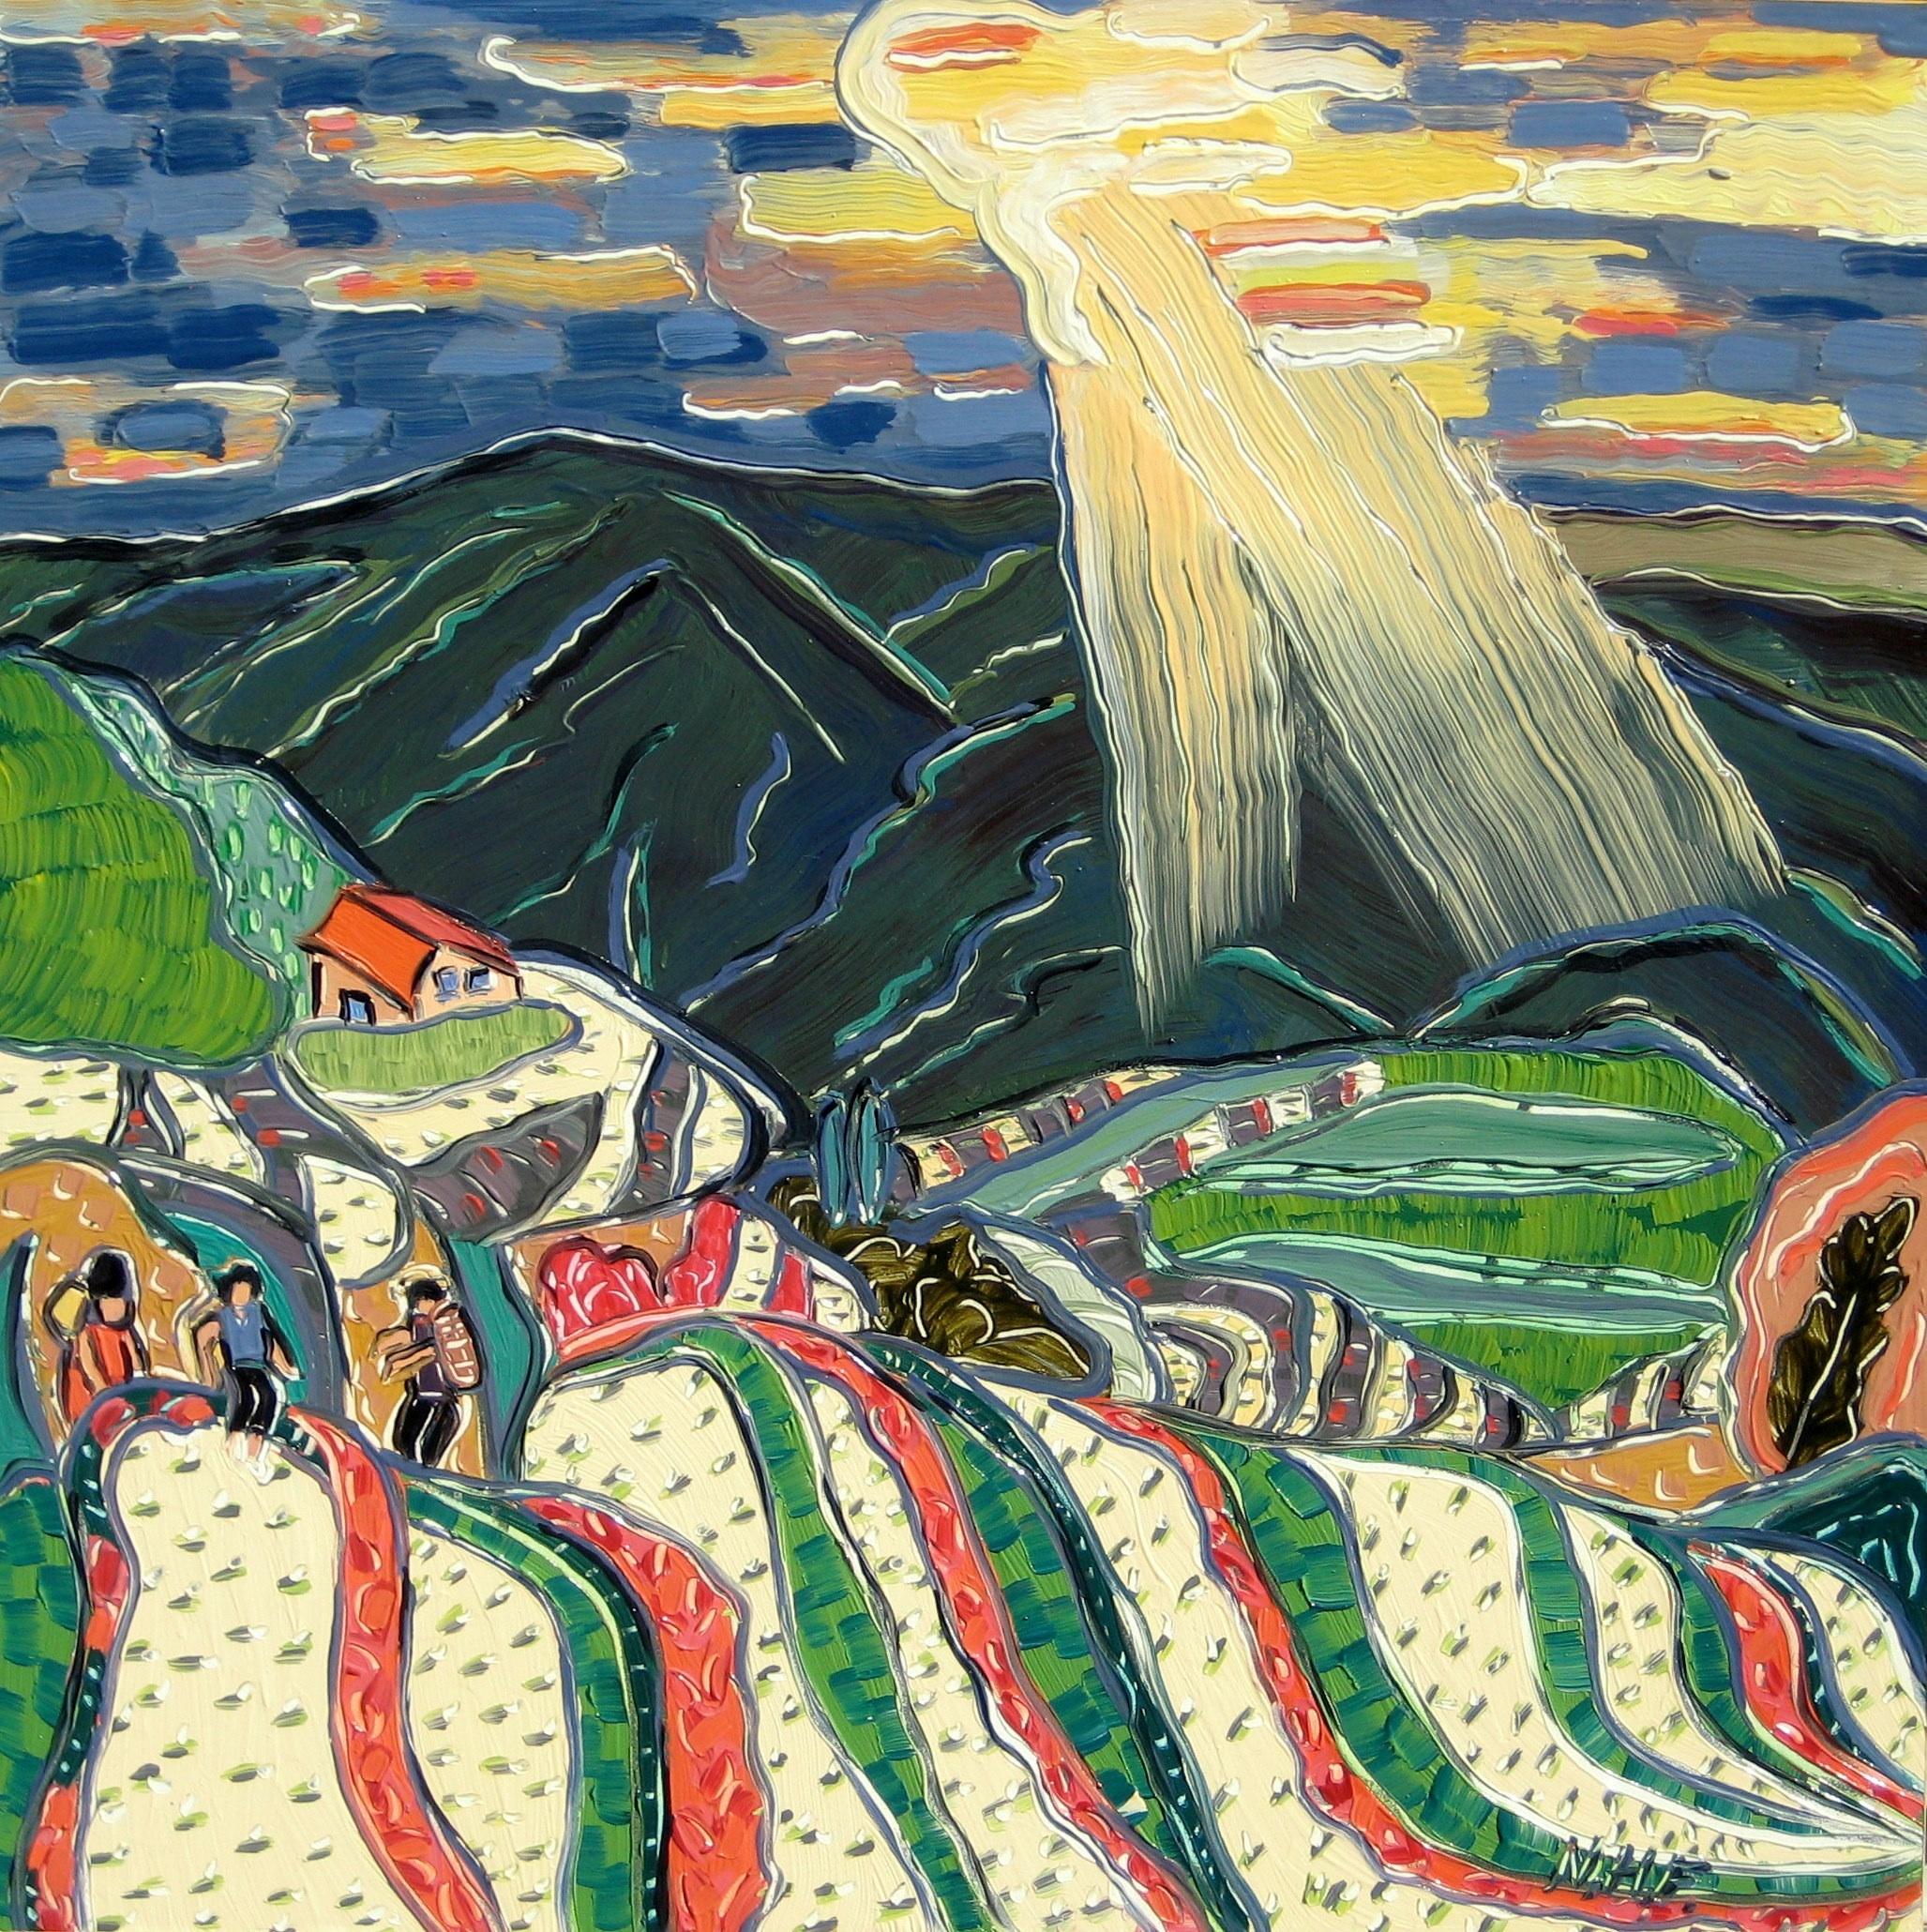 Nan Hass Feldman,  Evening at the Rice Terraces , Oil on panel, 12x12